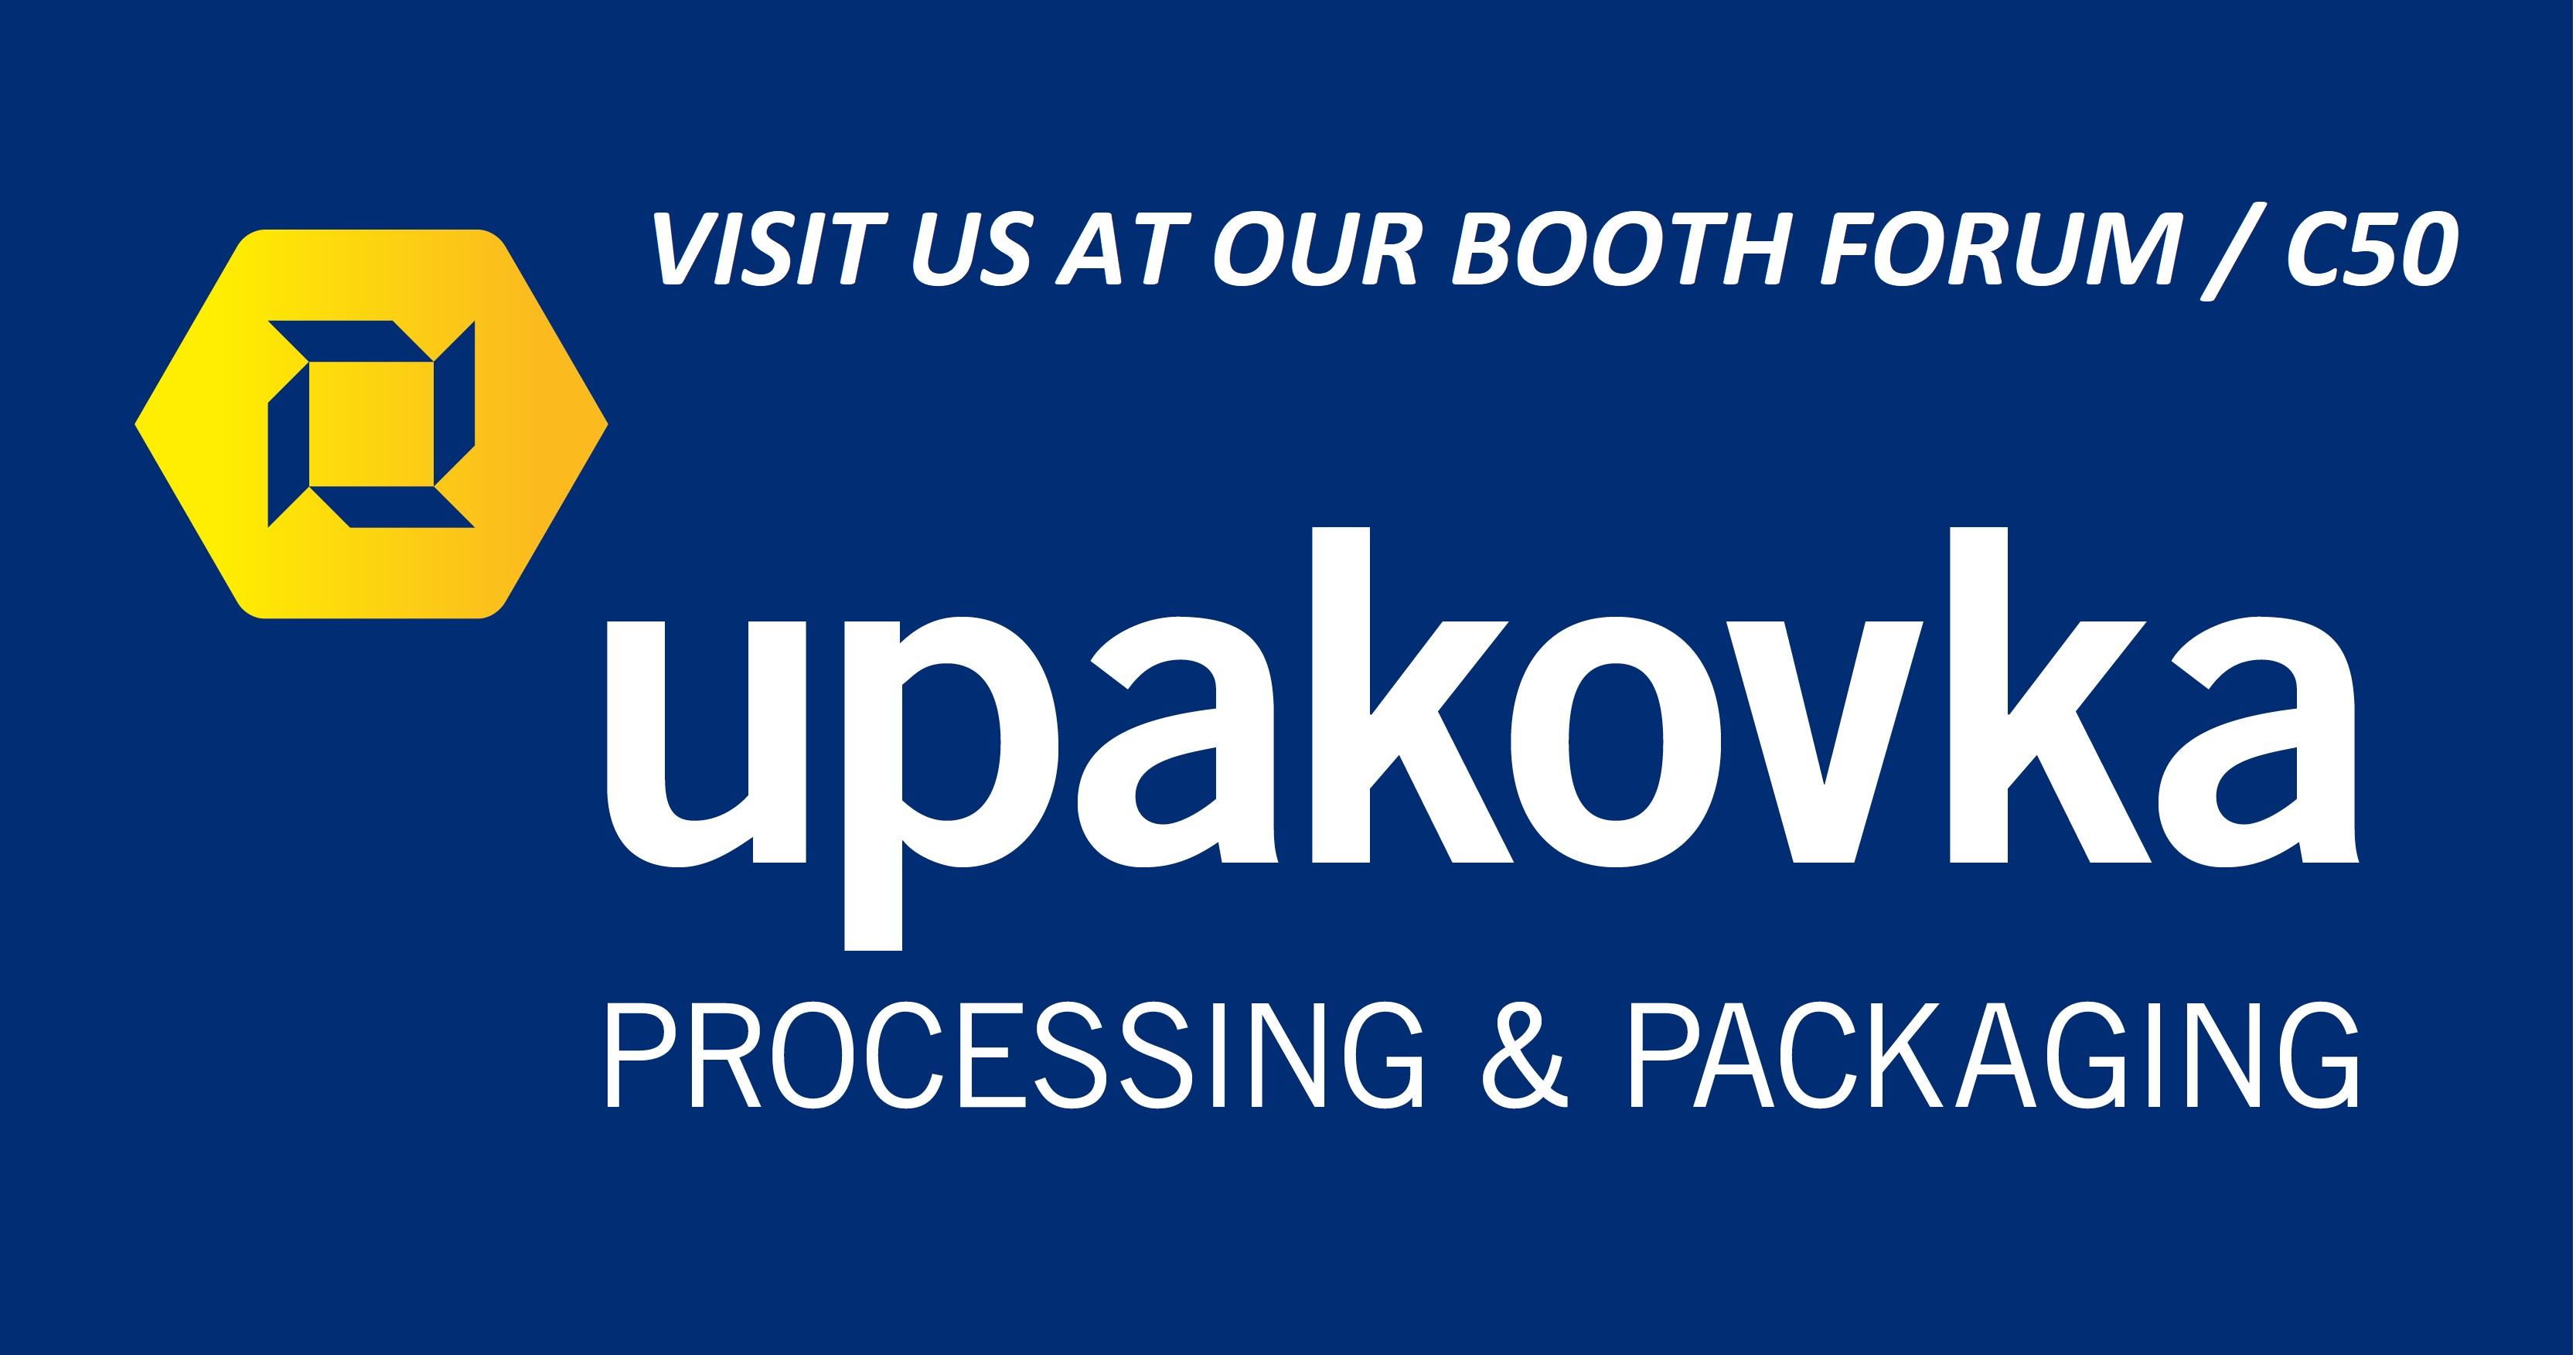 PTG exhibitor at Upakovka